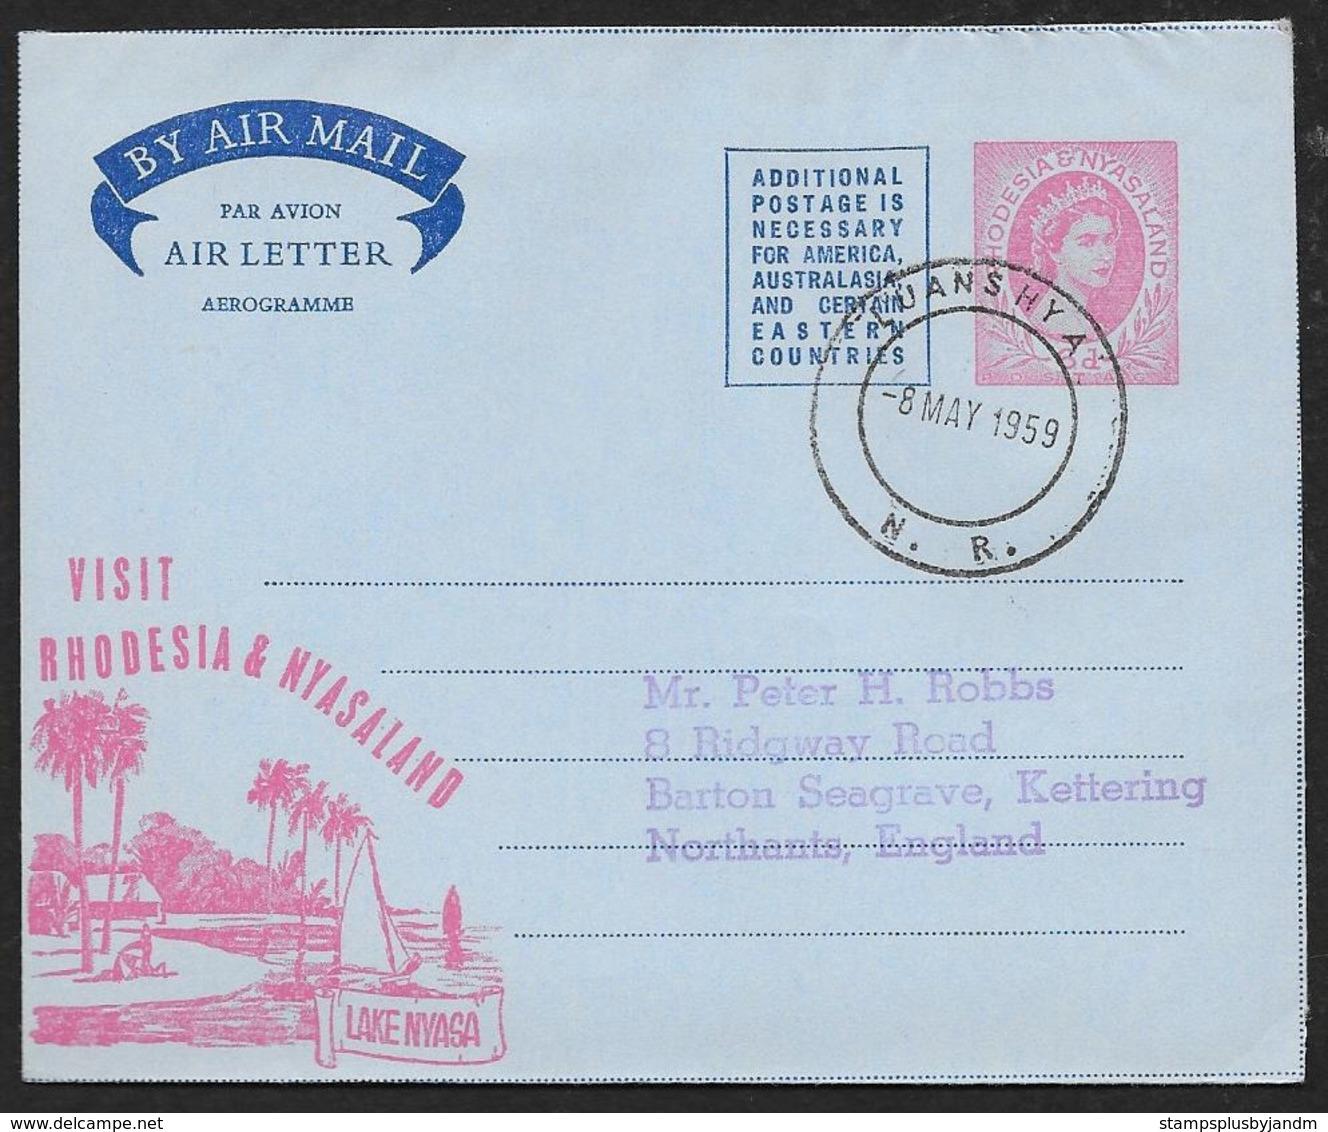 RHODESIA & NYASALAND Aerogramme 6d Queen 1959 Luanshya Cancel To England Lake Nyasa Cachet! STK#X21340 - Rhodesia & Nyasaland (1954-1963)